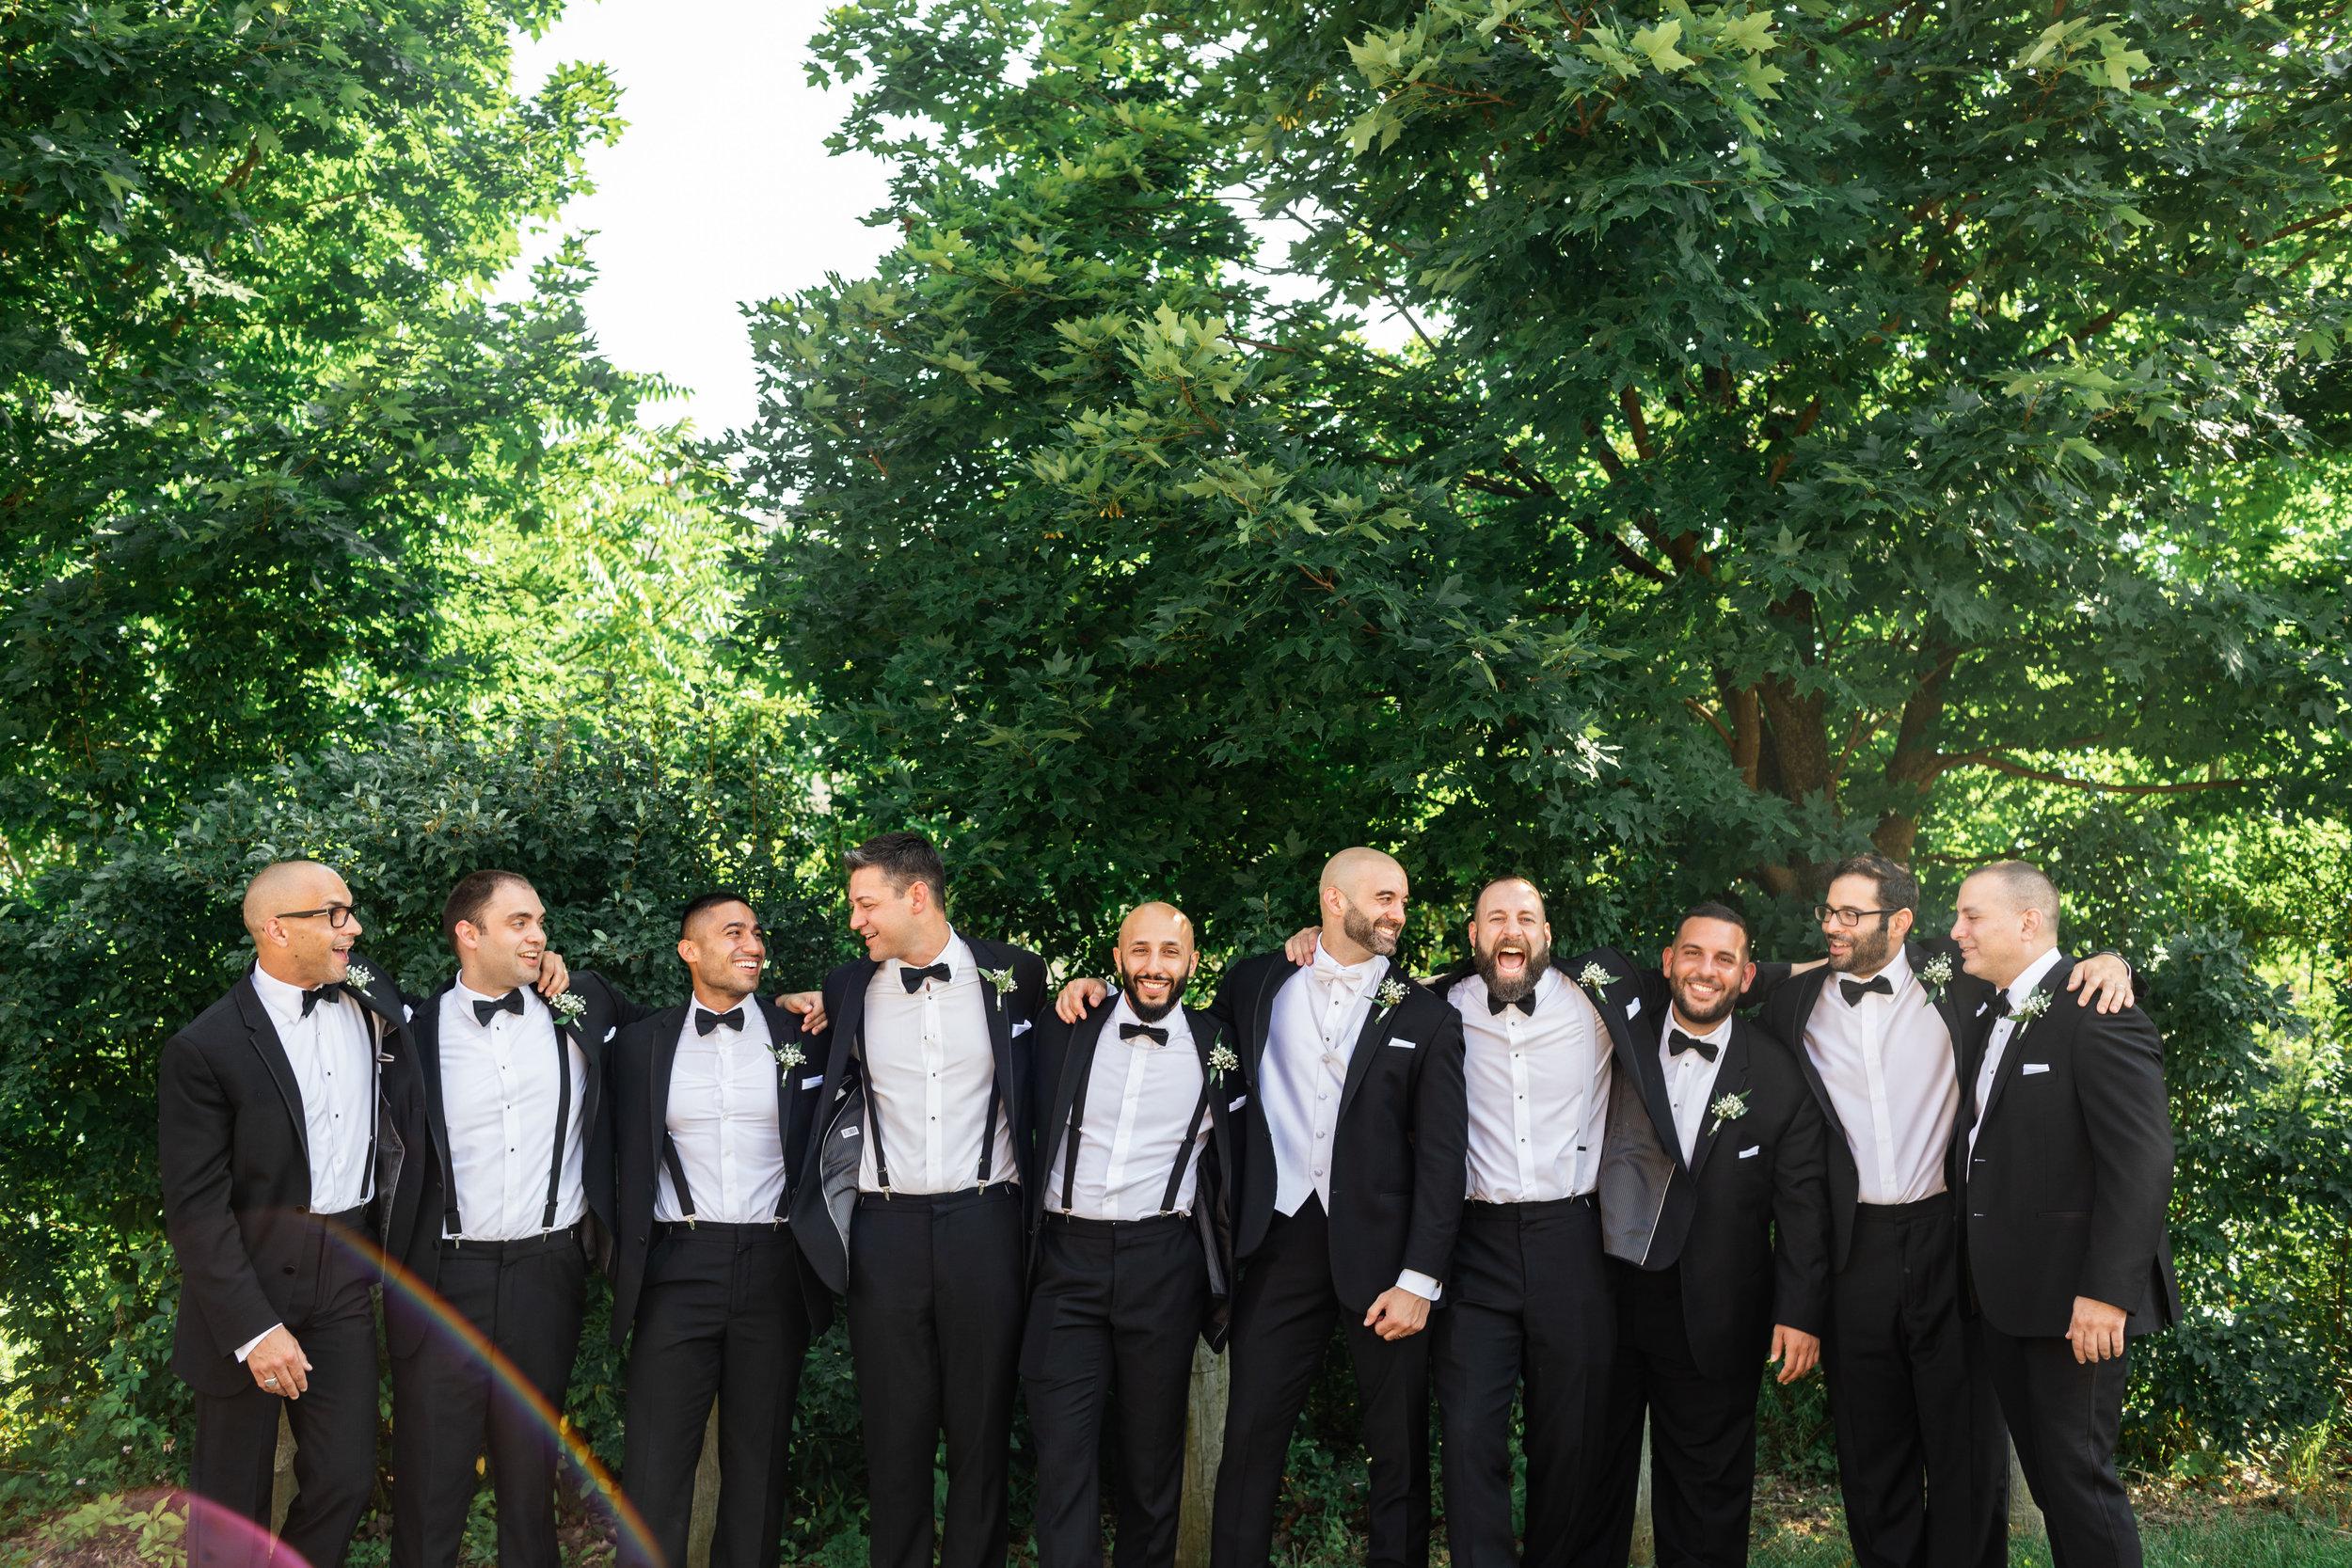 Cleveland_Wedding_Photographer_Lindsey_Ramdin-22.jpg